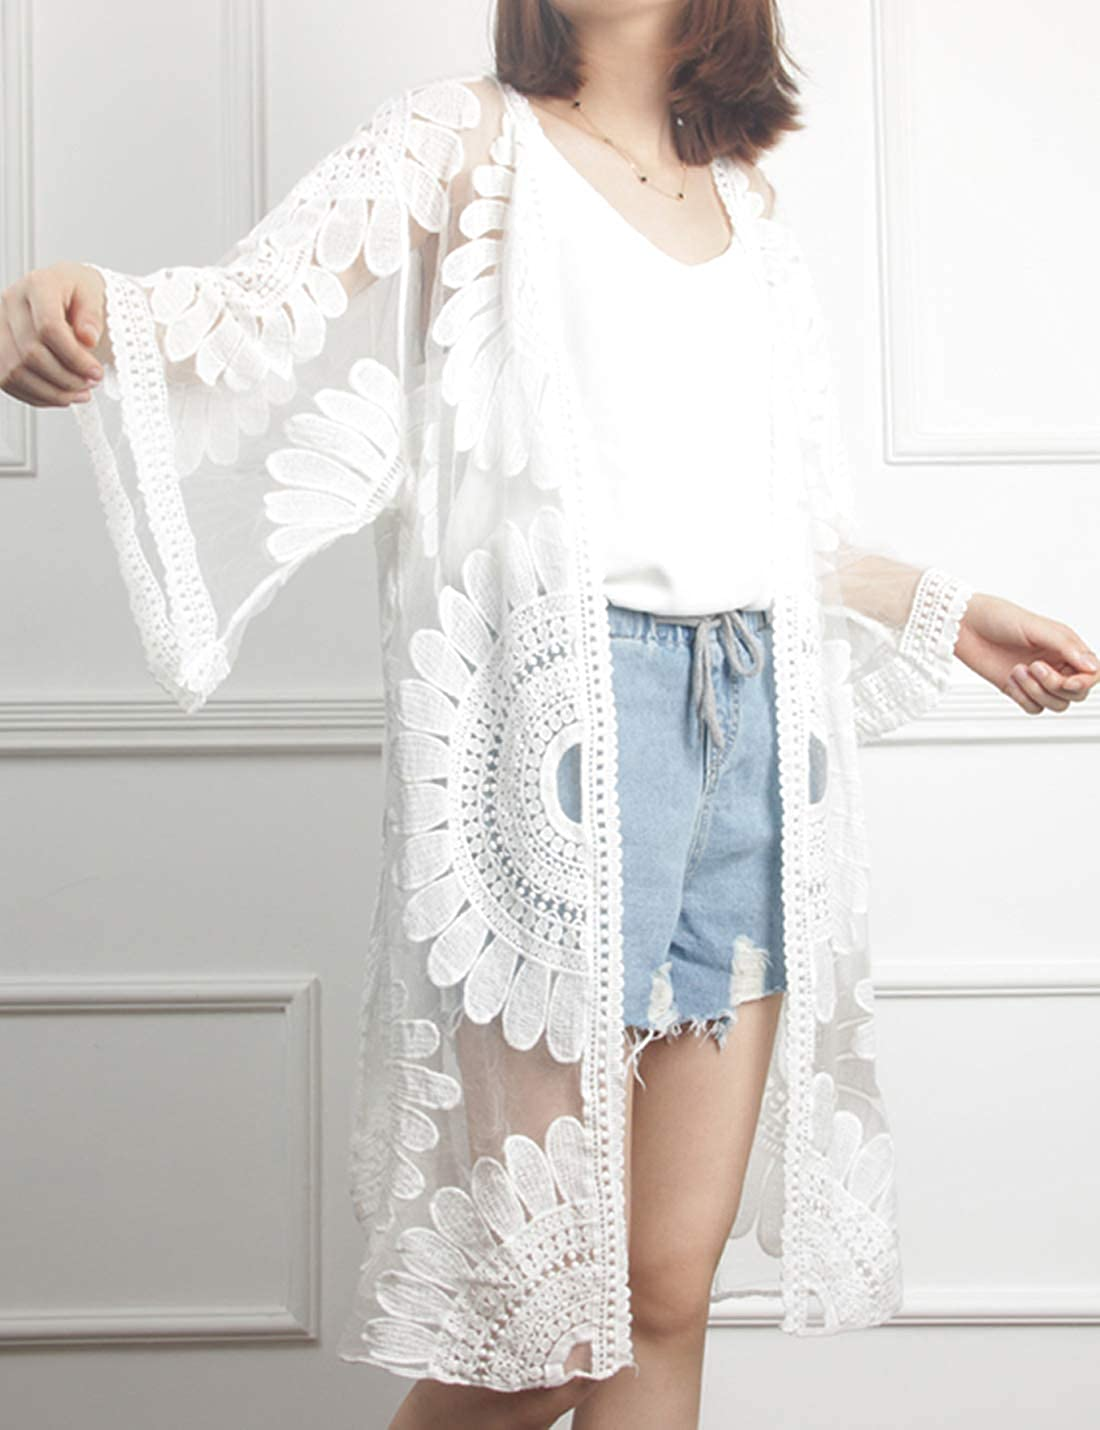 Liengoron Womens Summer Fashion Lace Cardigan Sun Flower Hollow Sun Protection Clothing